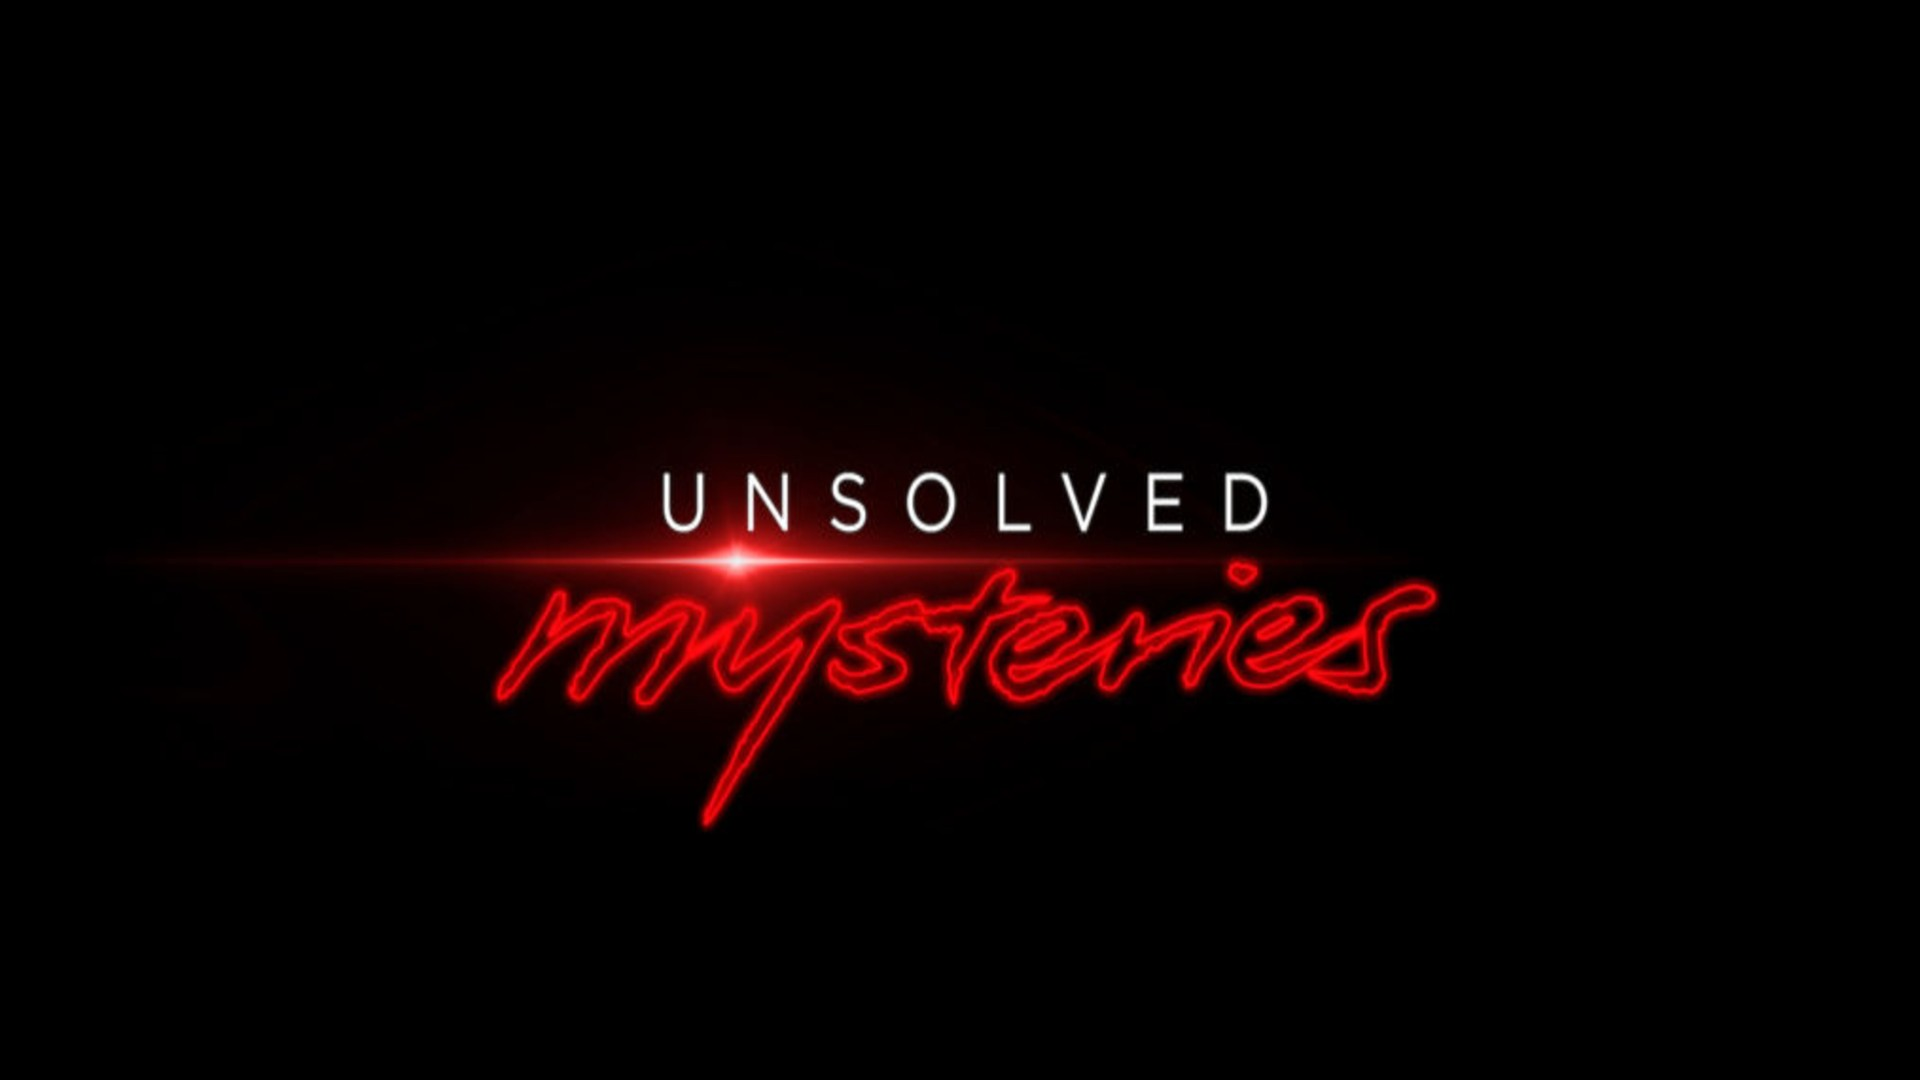 Unsolved Mysteries 2. Cilt fragmanı yayımlandı